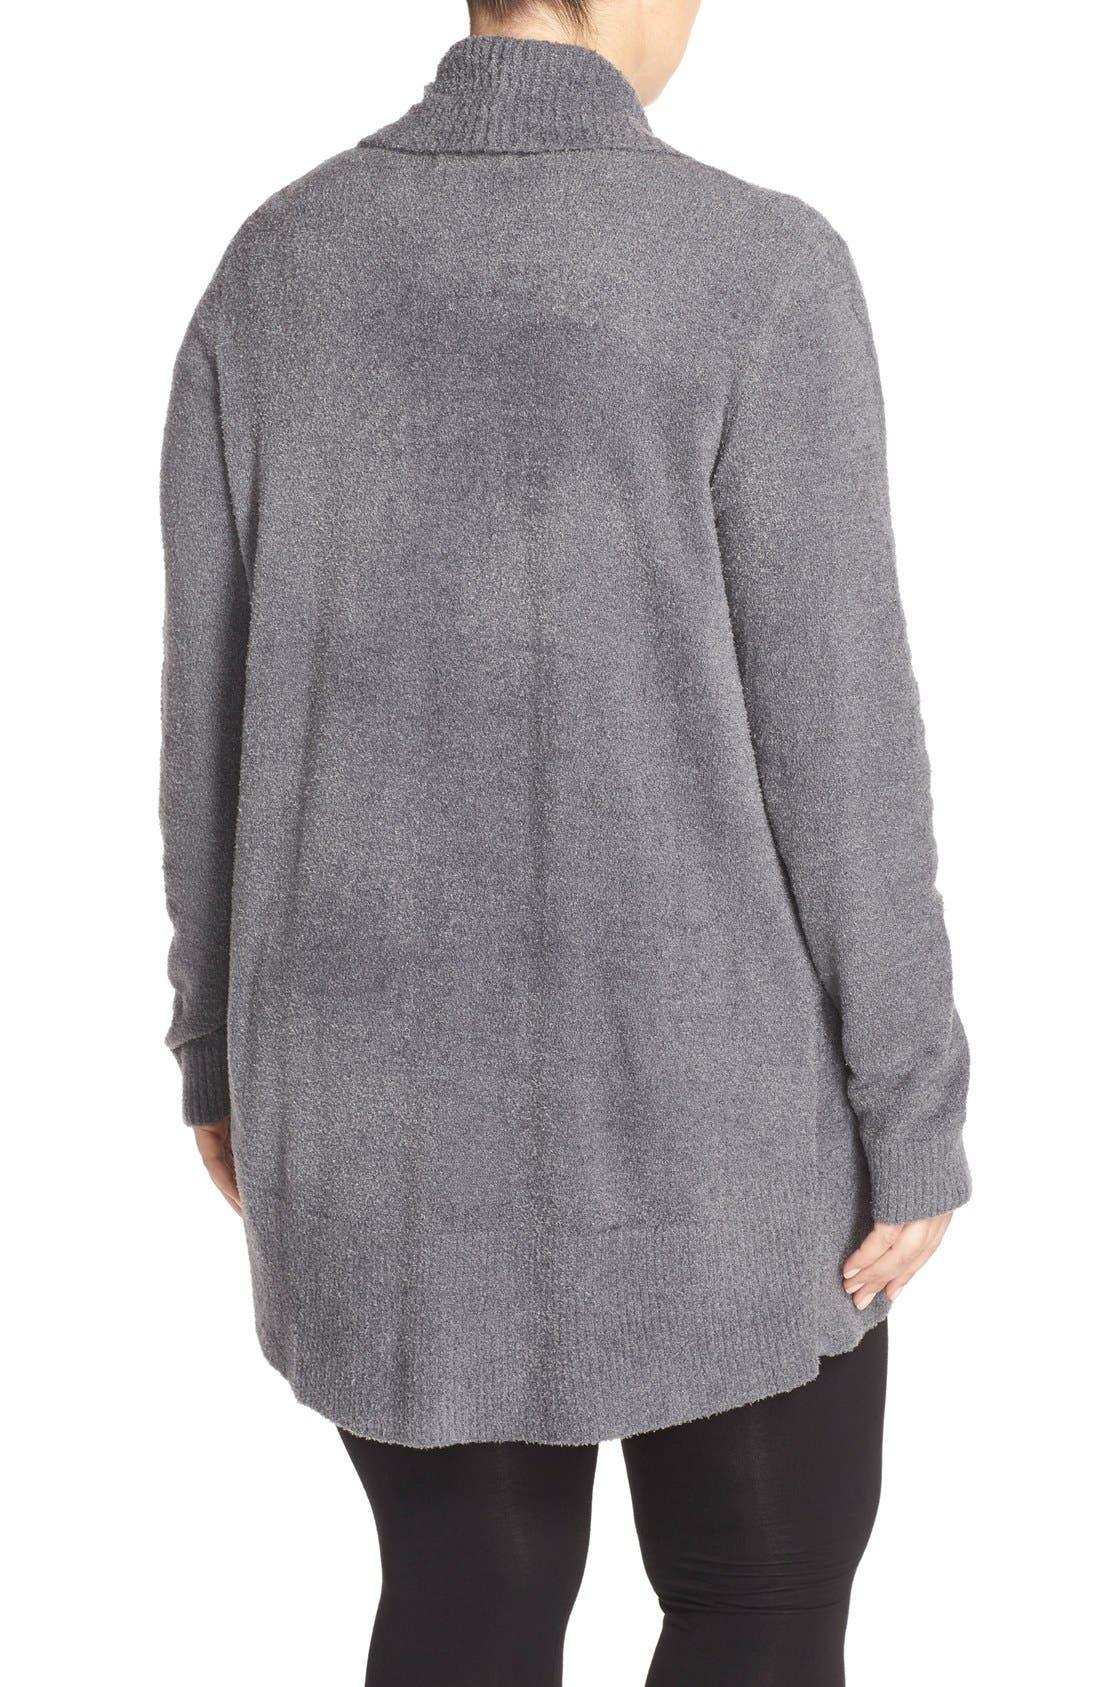 Alternate Image 2  - Barefoot Dreams® CozyChic Lite® Circle Cardigan (Plus Size)